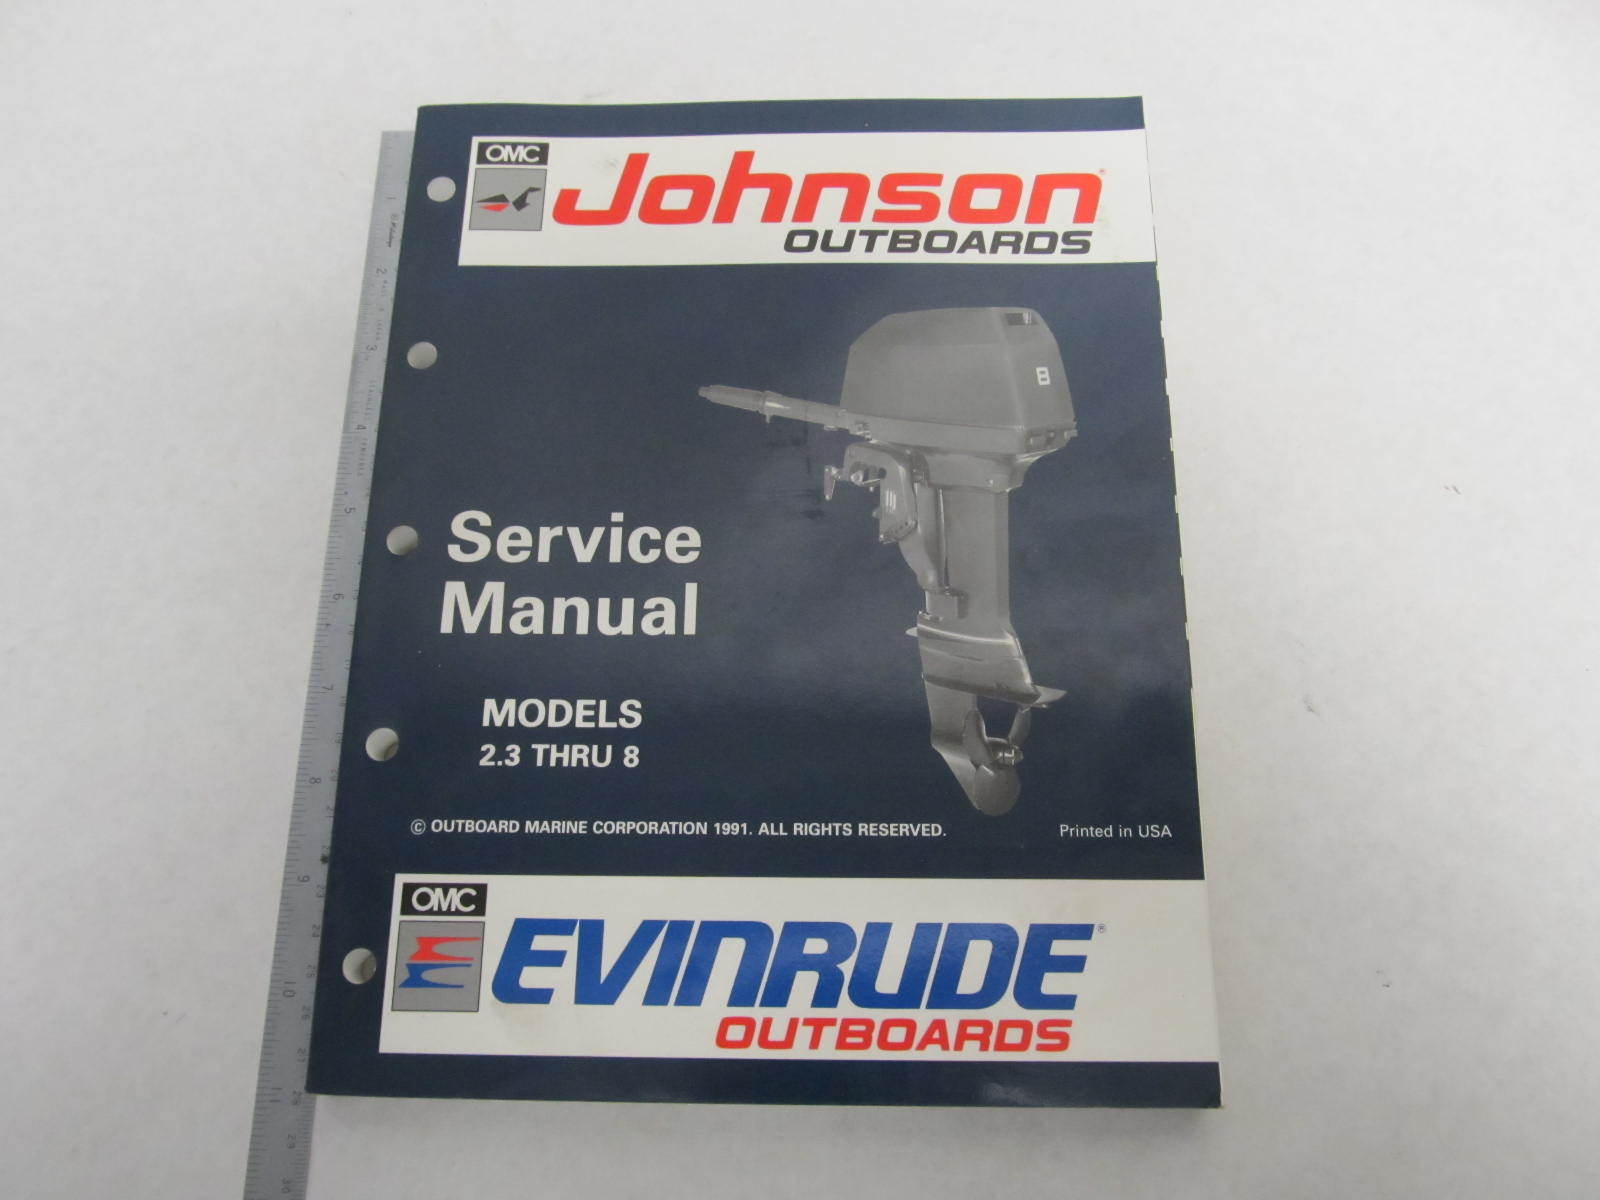 8hp johnson outboard instruction manual Download 8HP Repair Manual